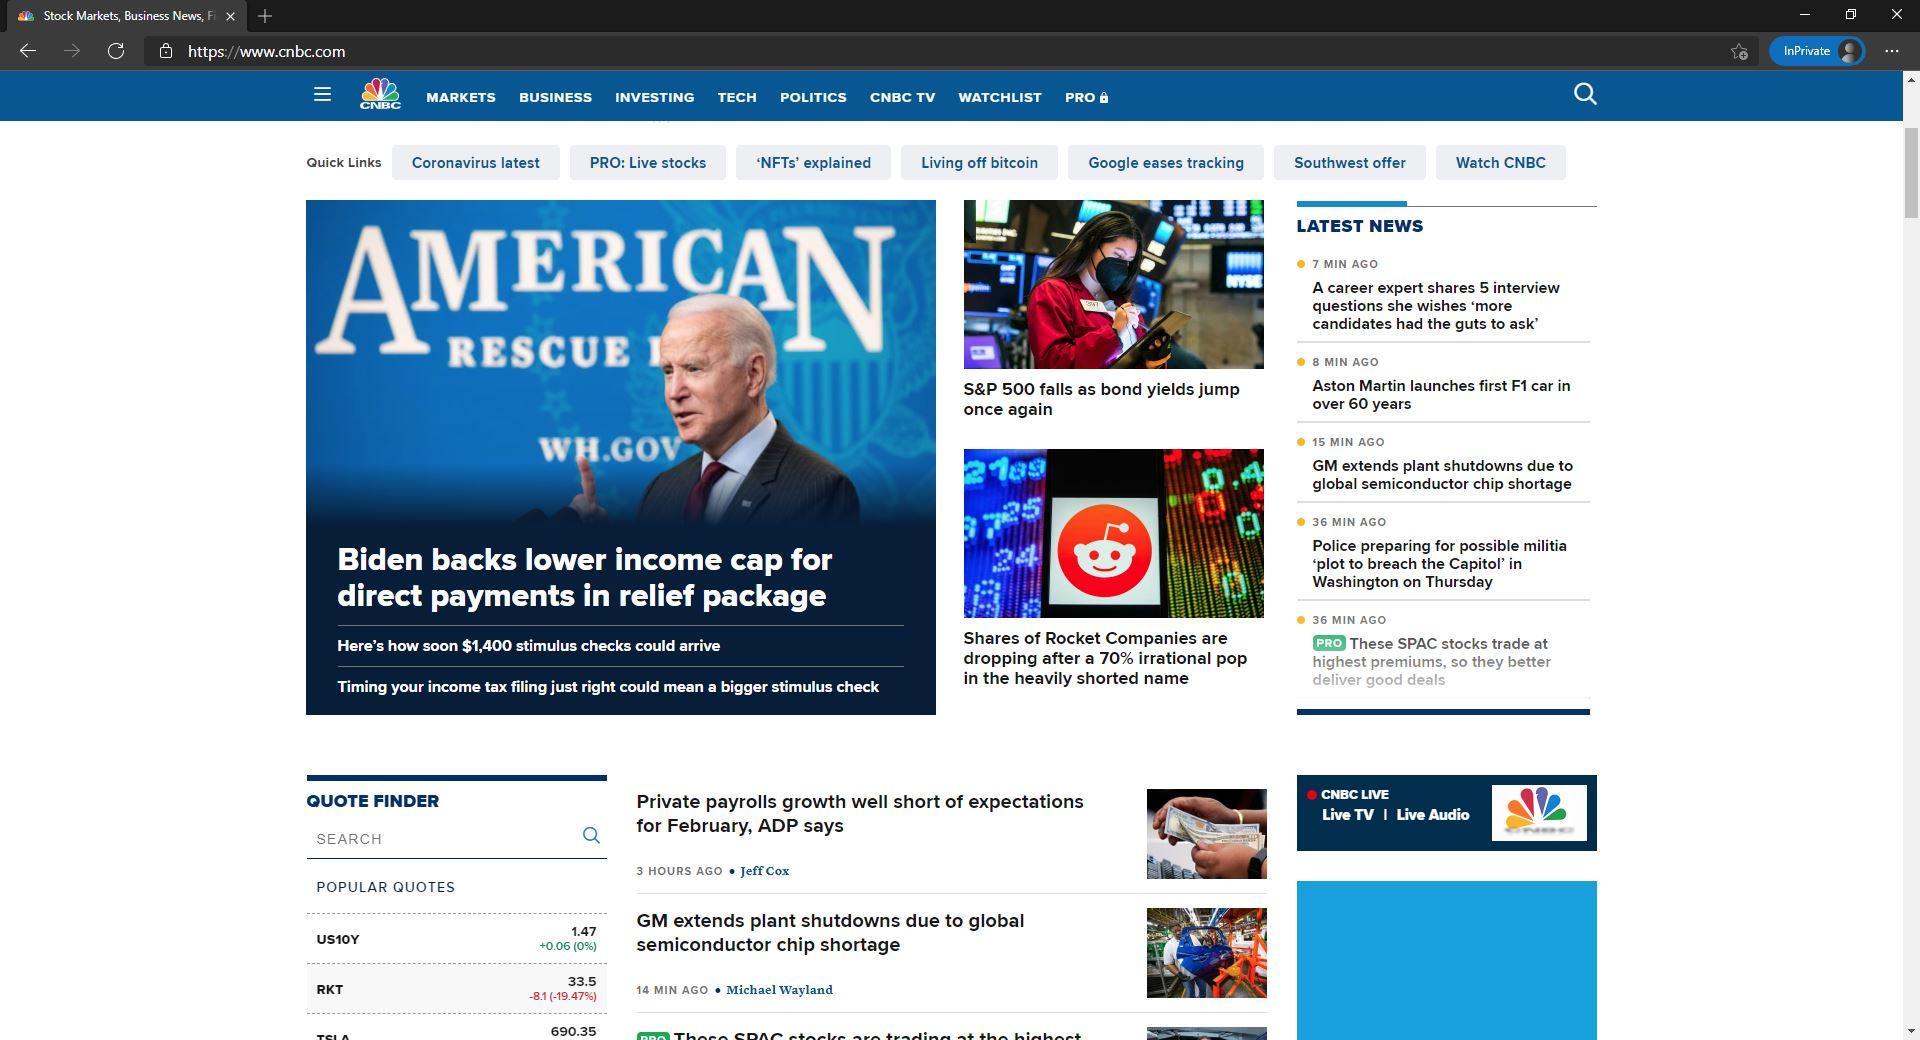 CNBC website homepage